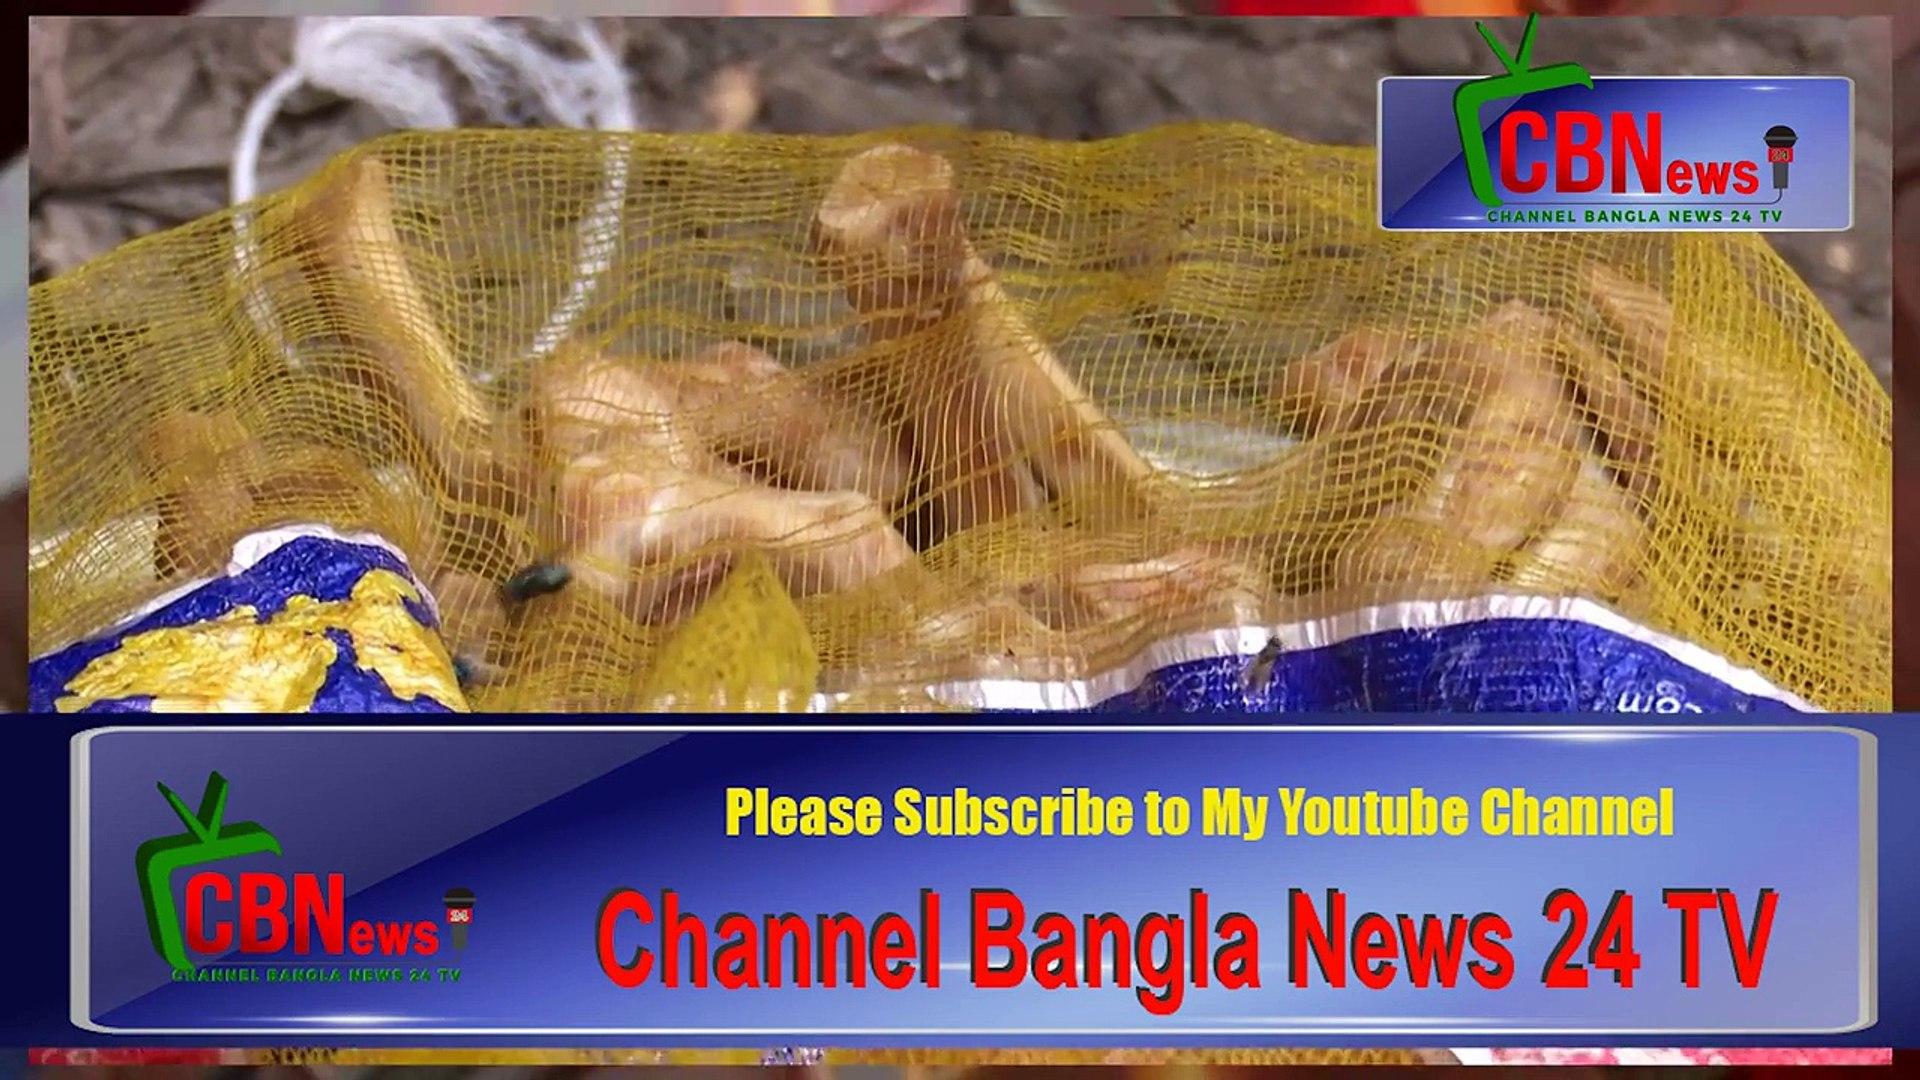 vajal action for eid-Channel Bangla News 24 TV- on You tube